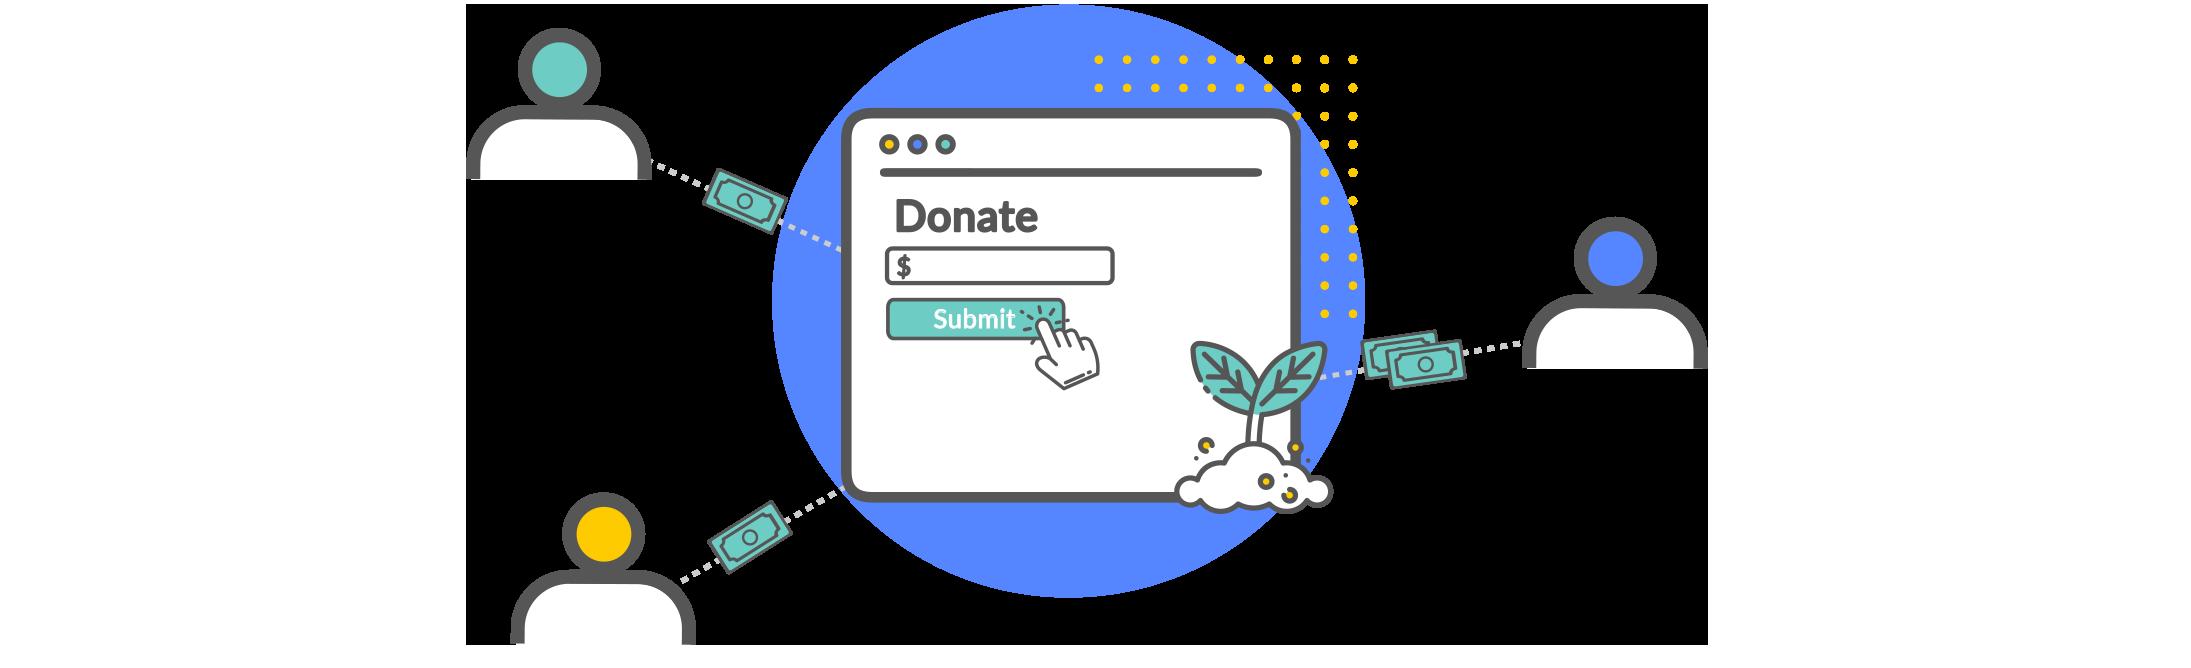 NonProfit_VirtualFundraiser